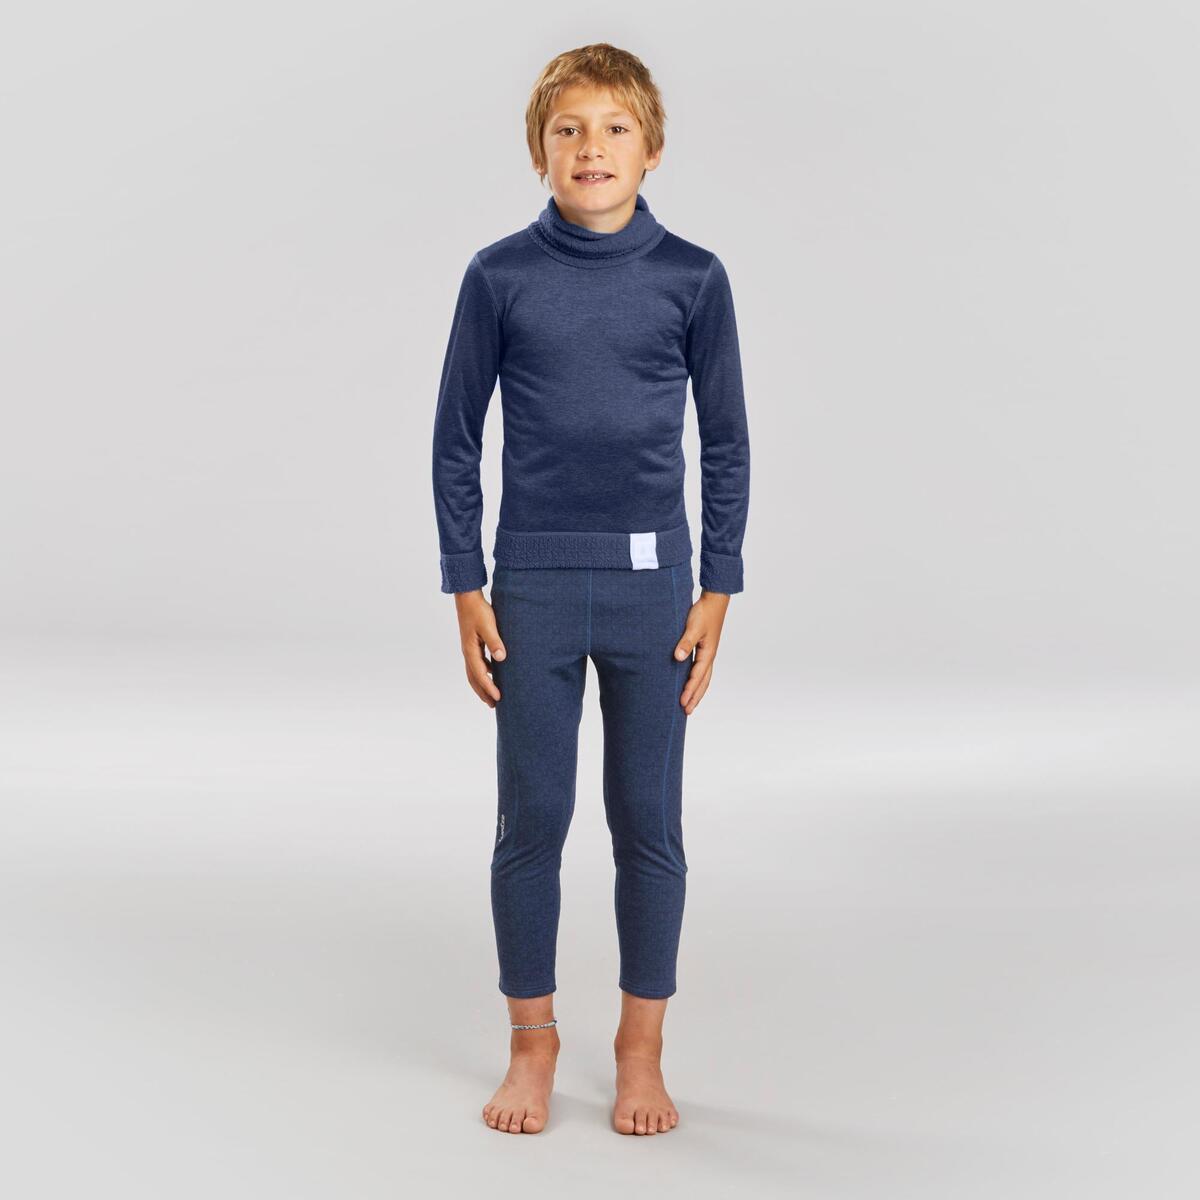 Bild 2 von Skiunterhose Funktionshose 500 Kinder marineblau